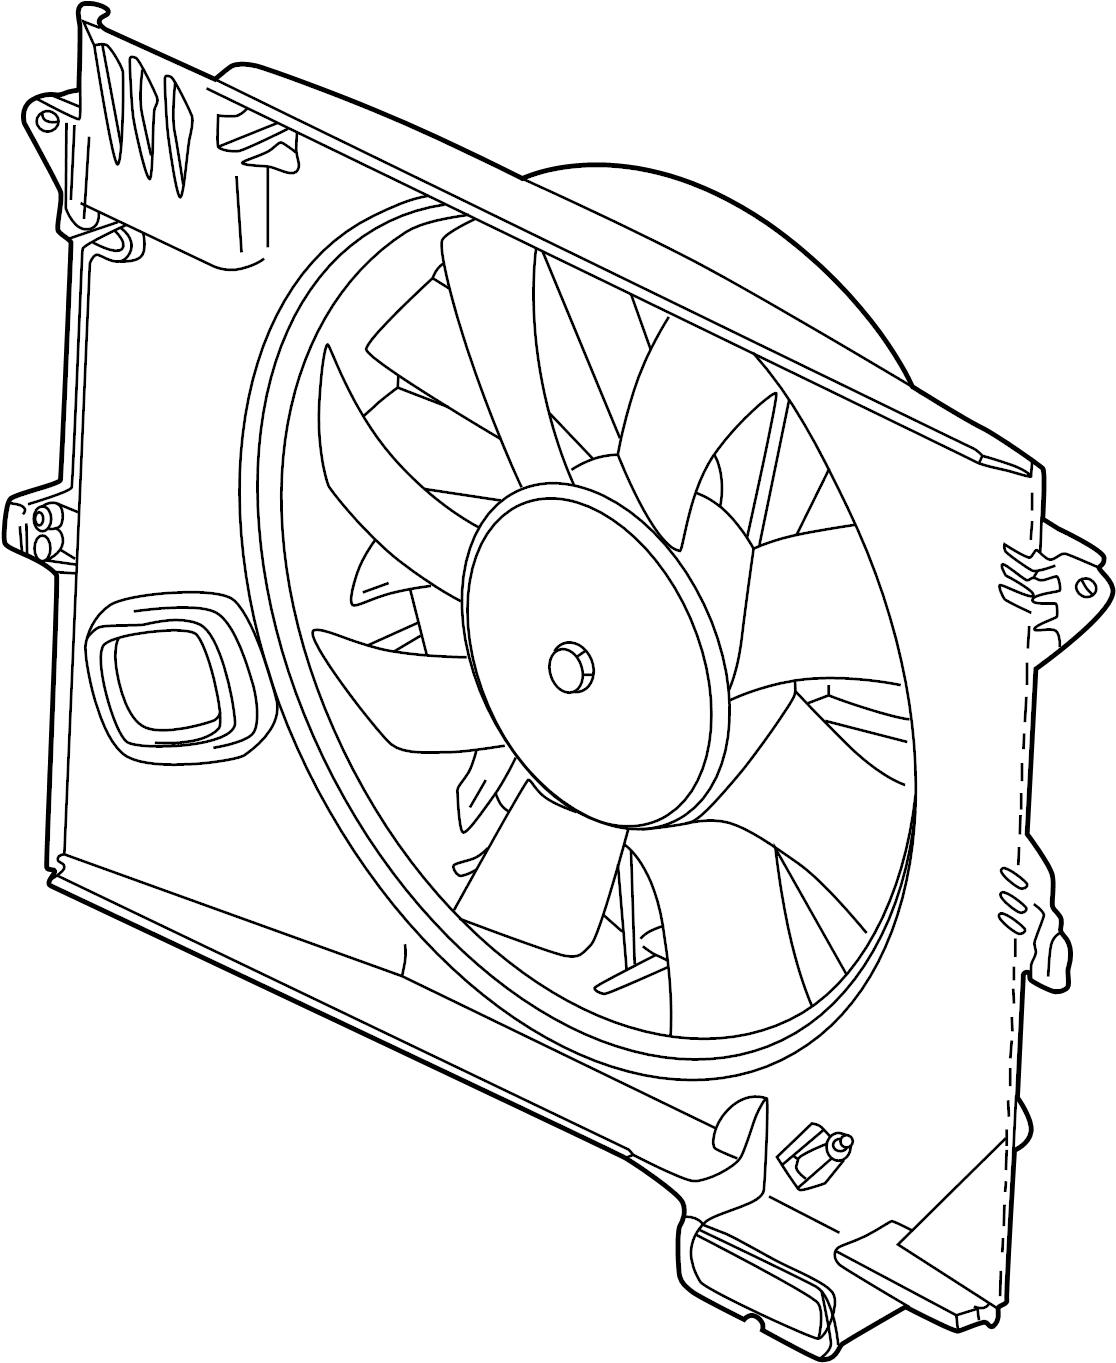 Jaguar Xk8 Engine Cooling Fan Assembly